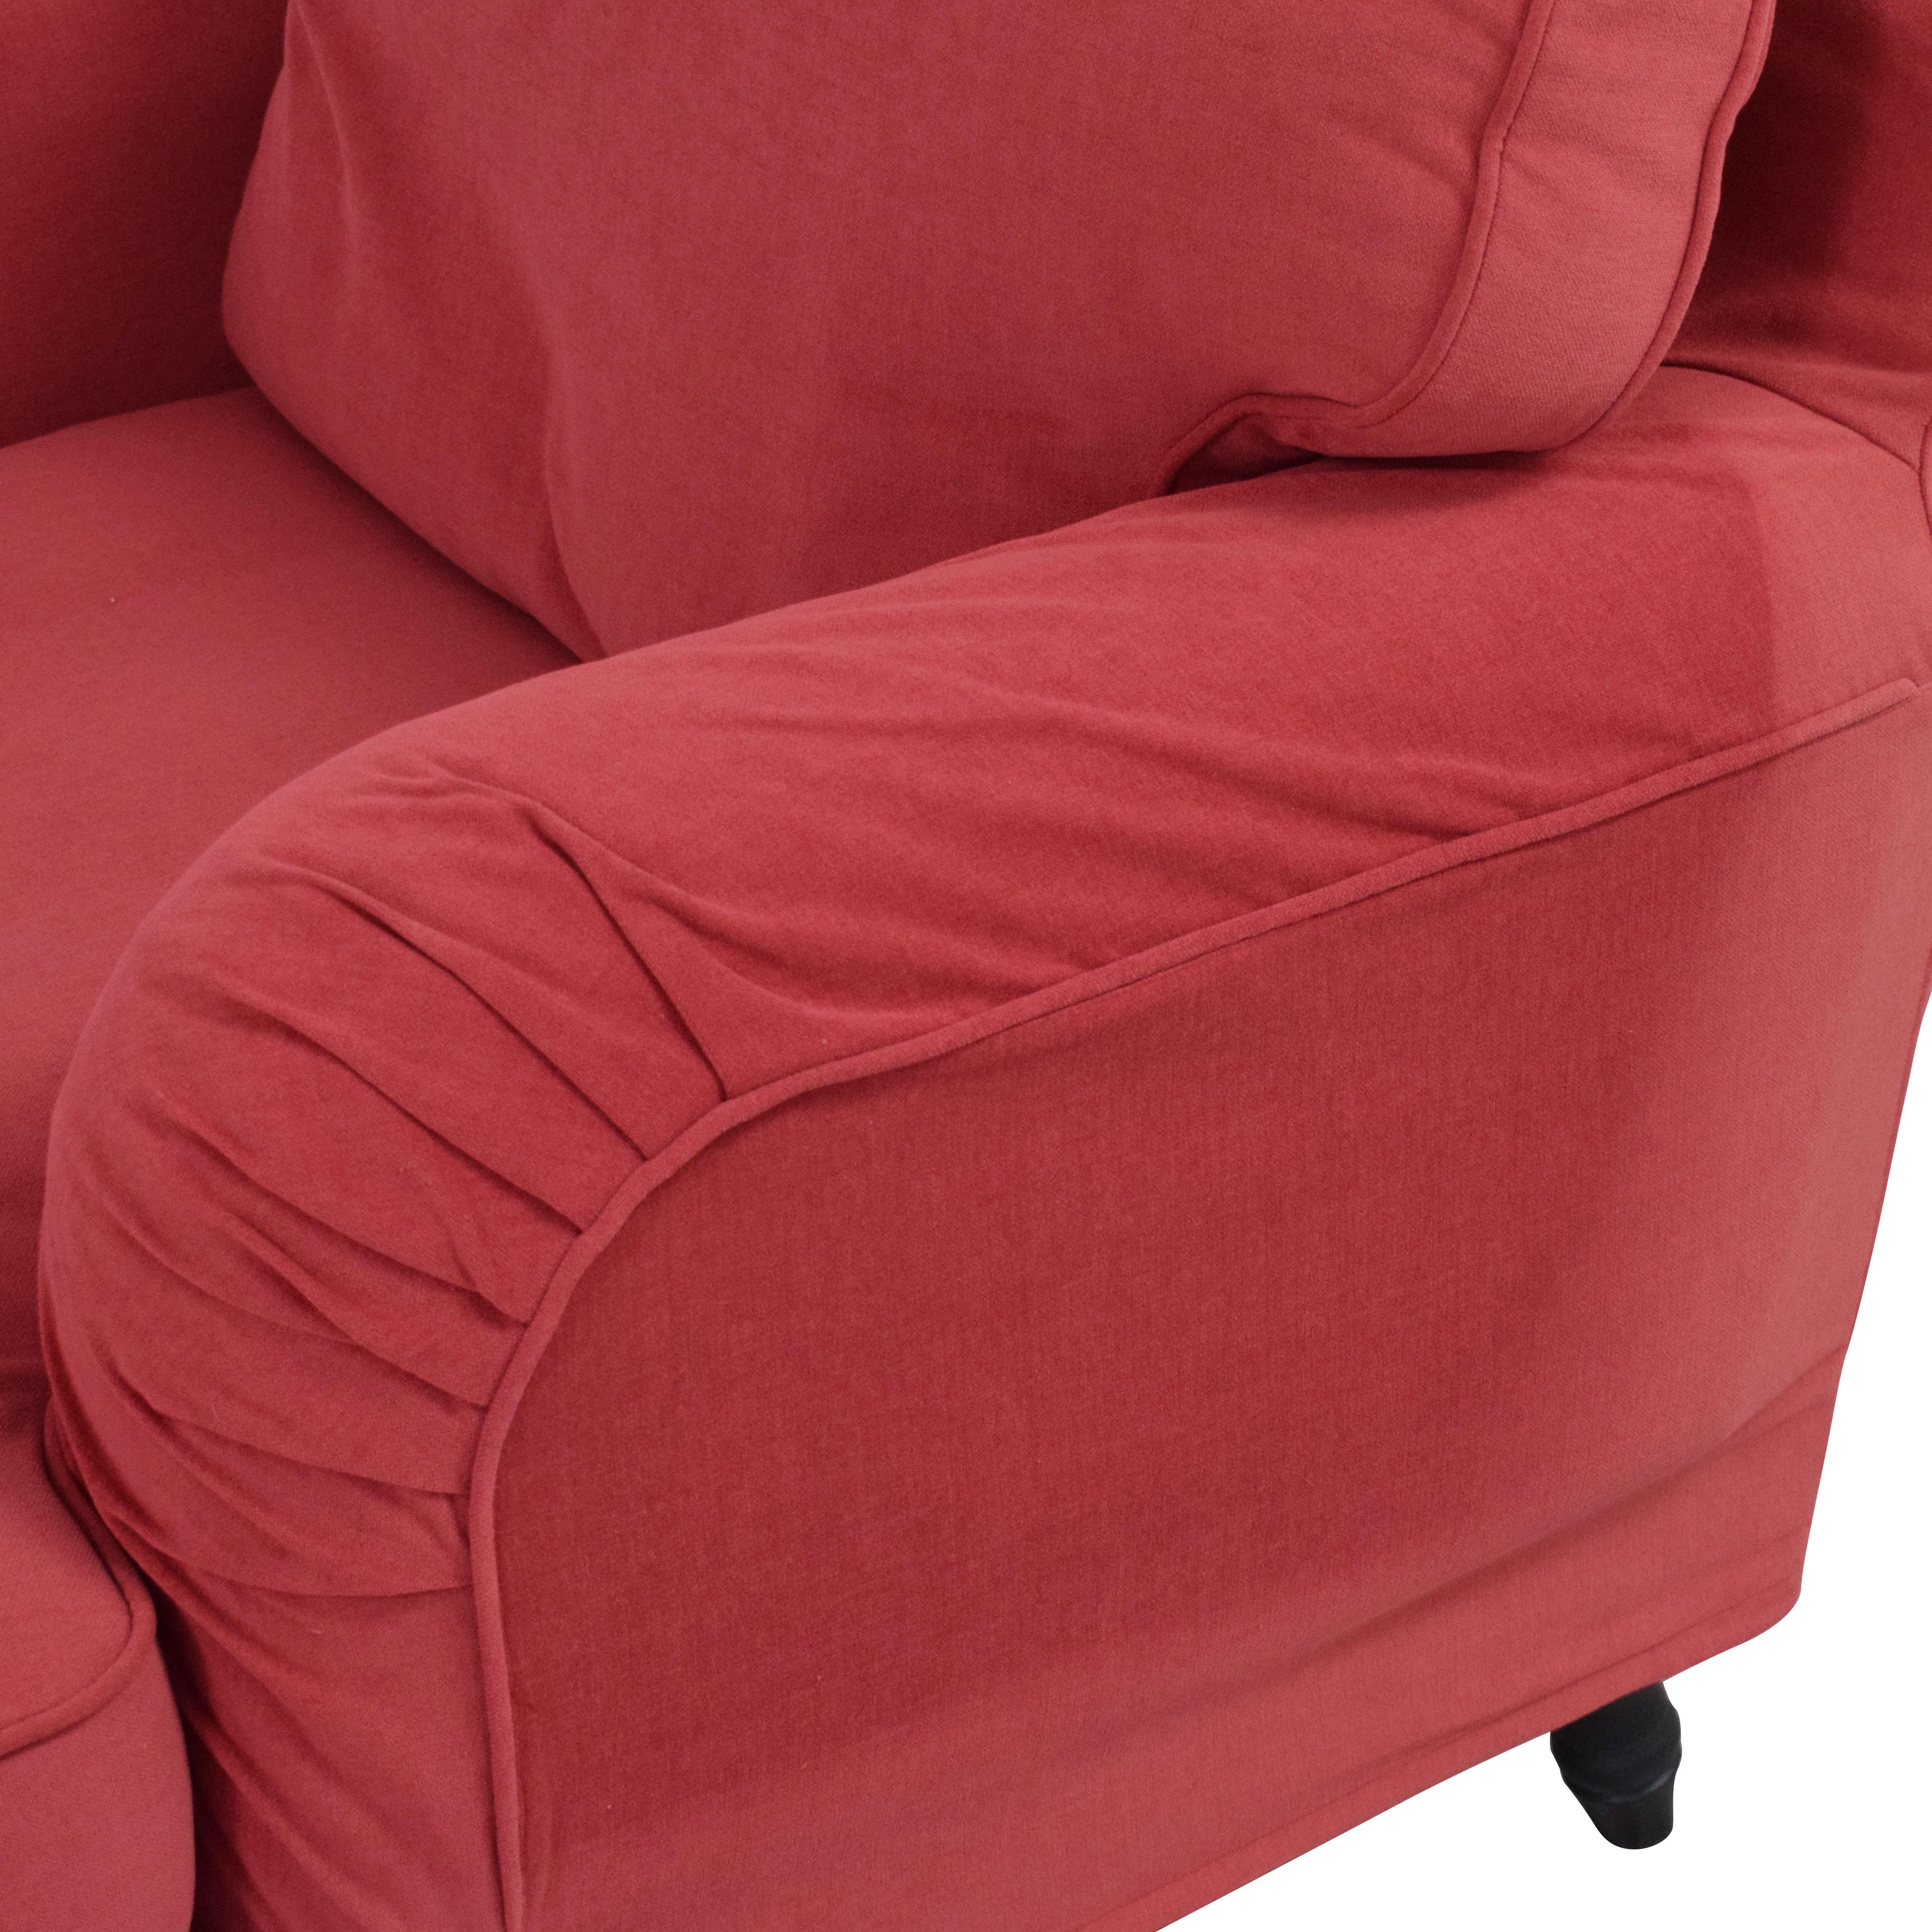 IKEA IKEA Chaise Lounge Chaises